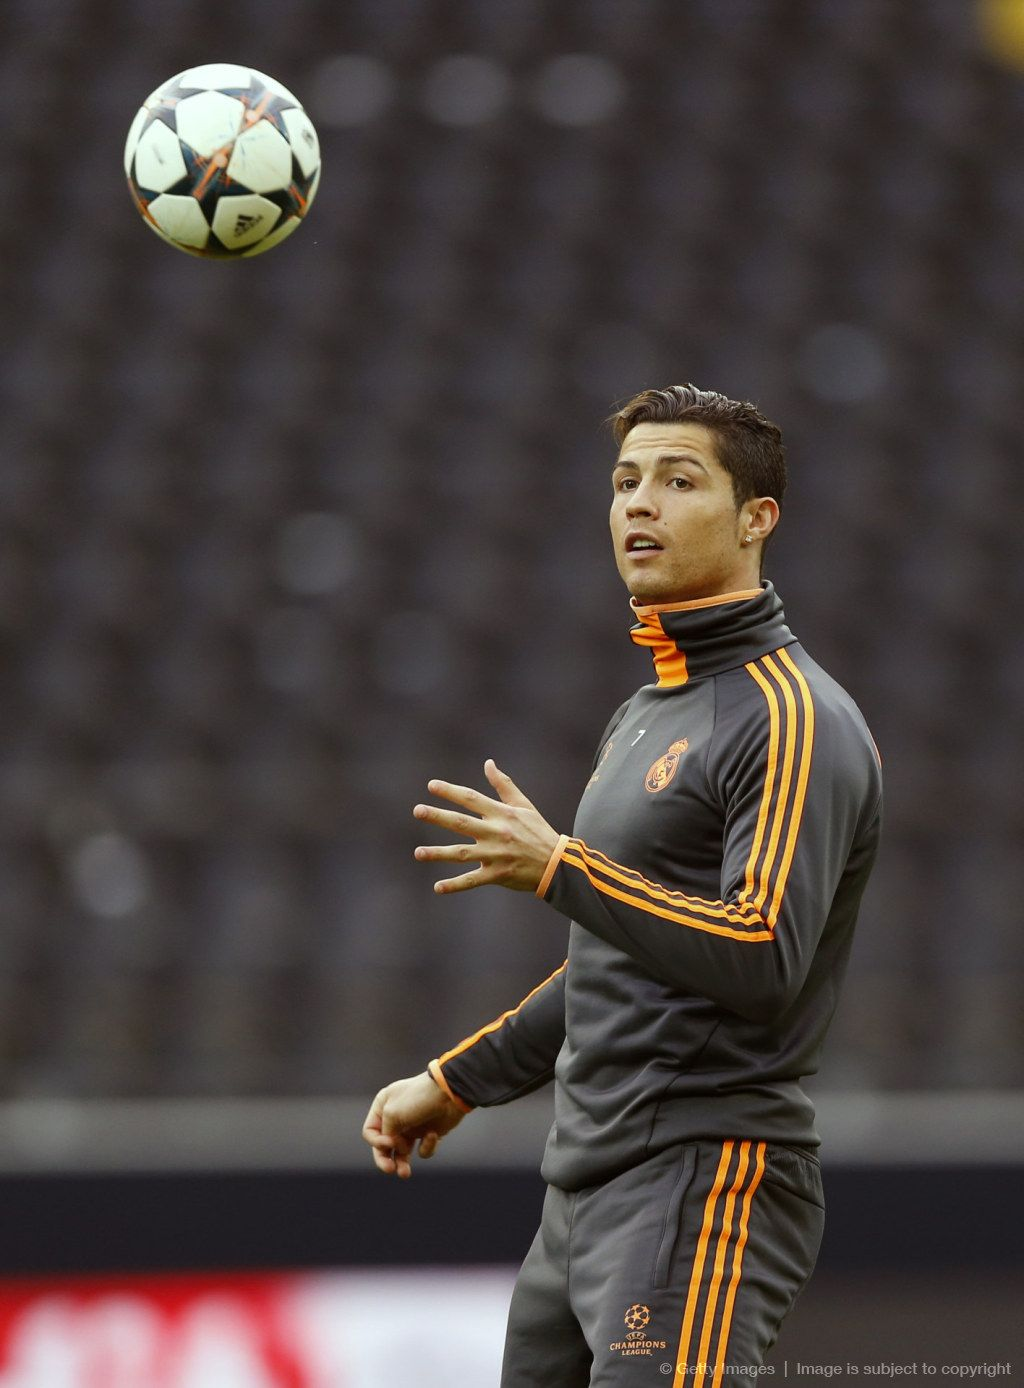 Cristiano Ronaldo | Soccer | Ronaldo, Cristiano ronaldo